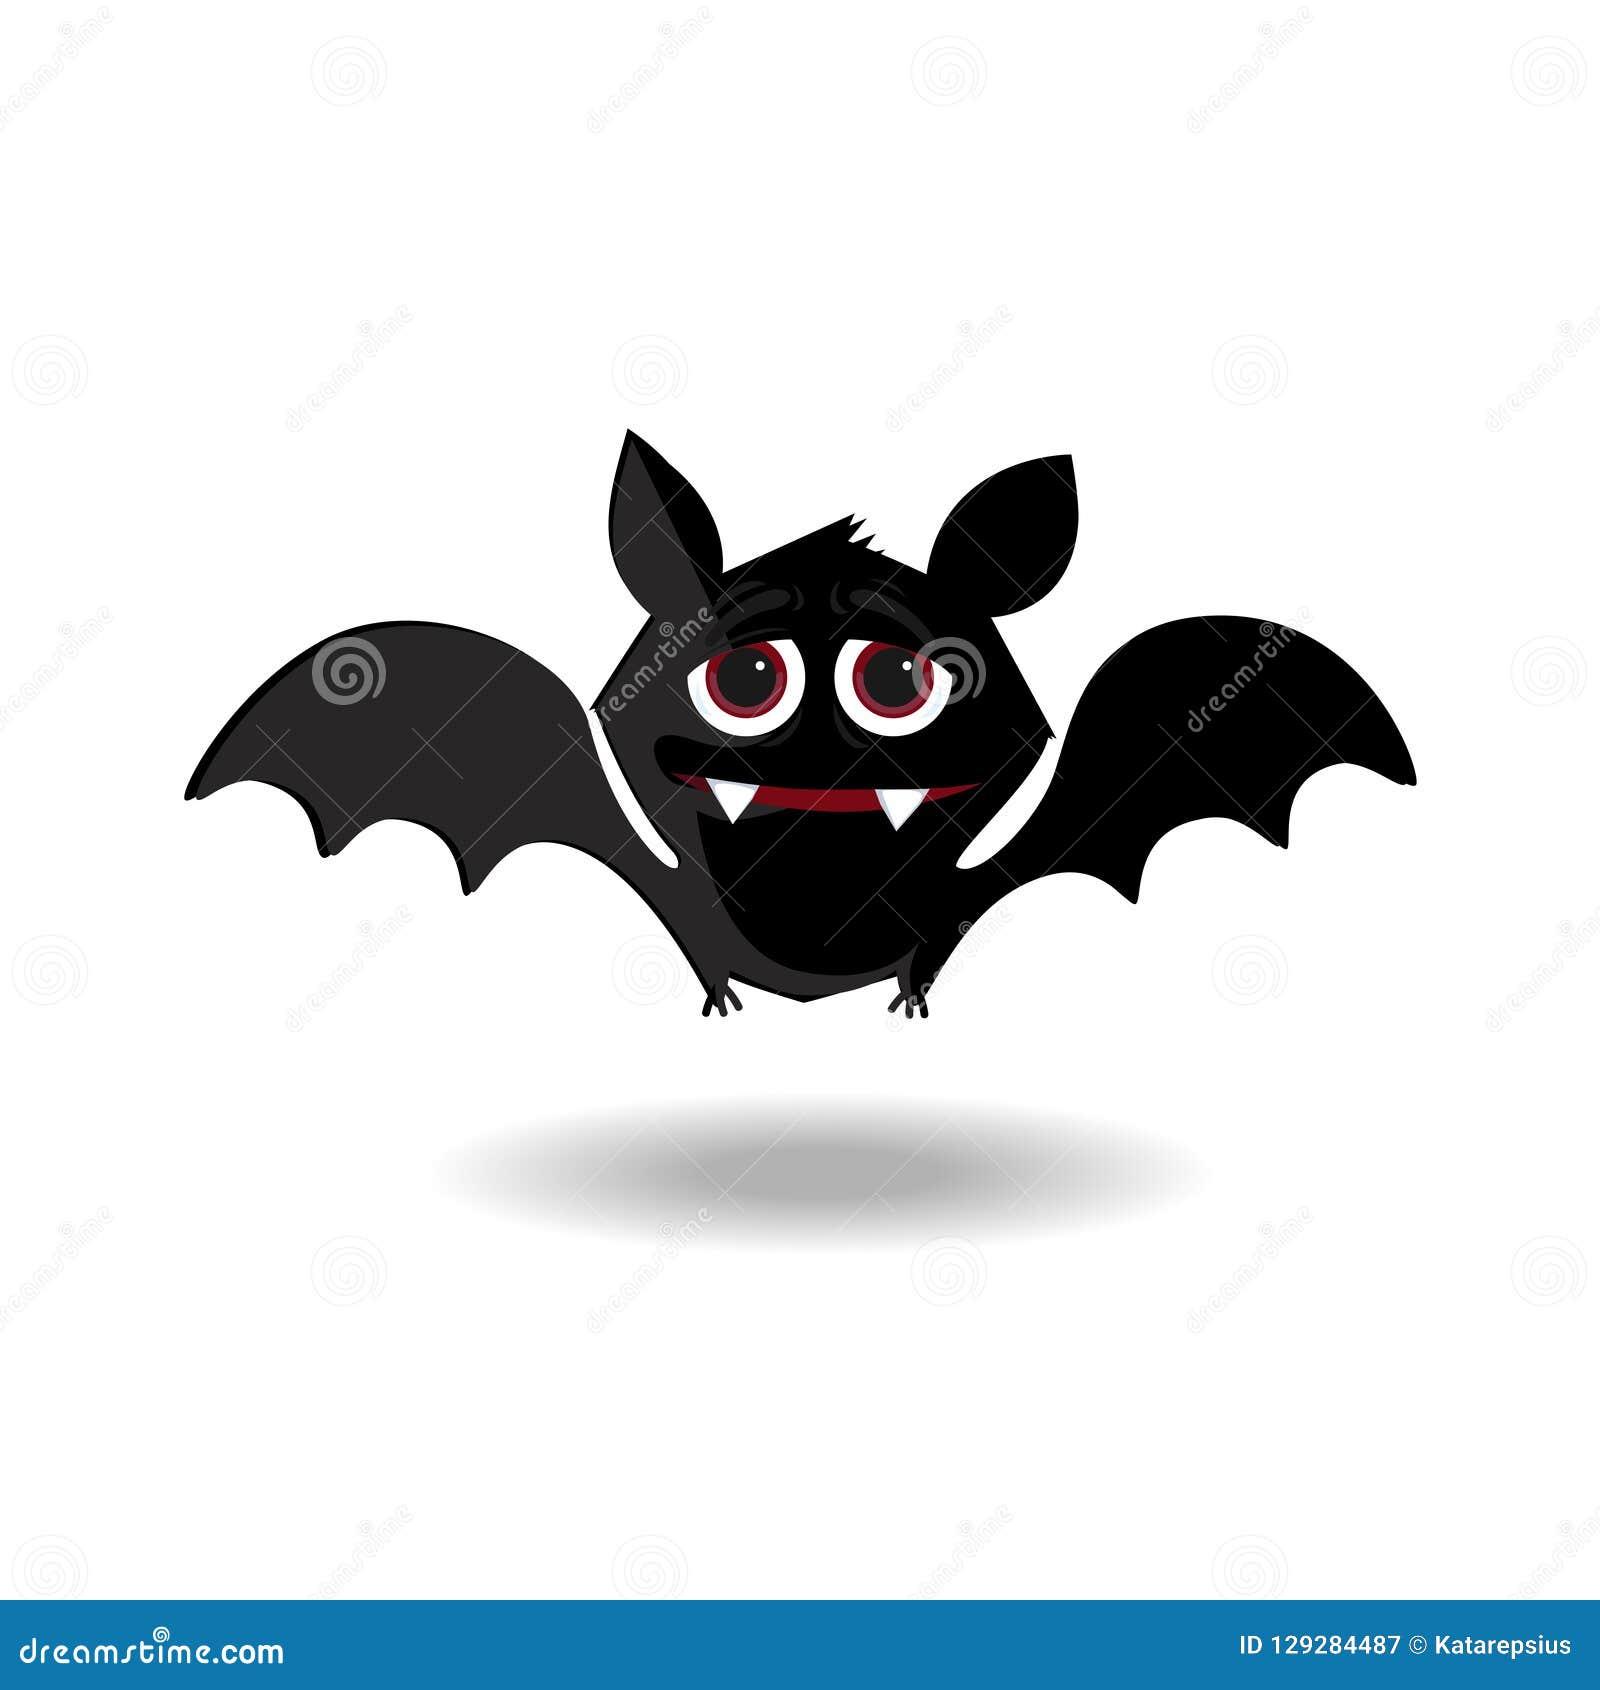 halloween clip art character of kawaii bat flittermouse for kids rh dreamstime com Halloween Witch Clip Art All Halloween Pictures Clip Art